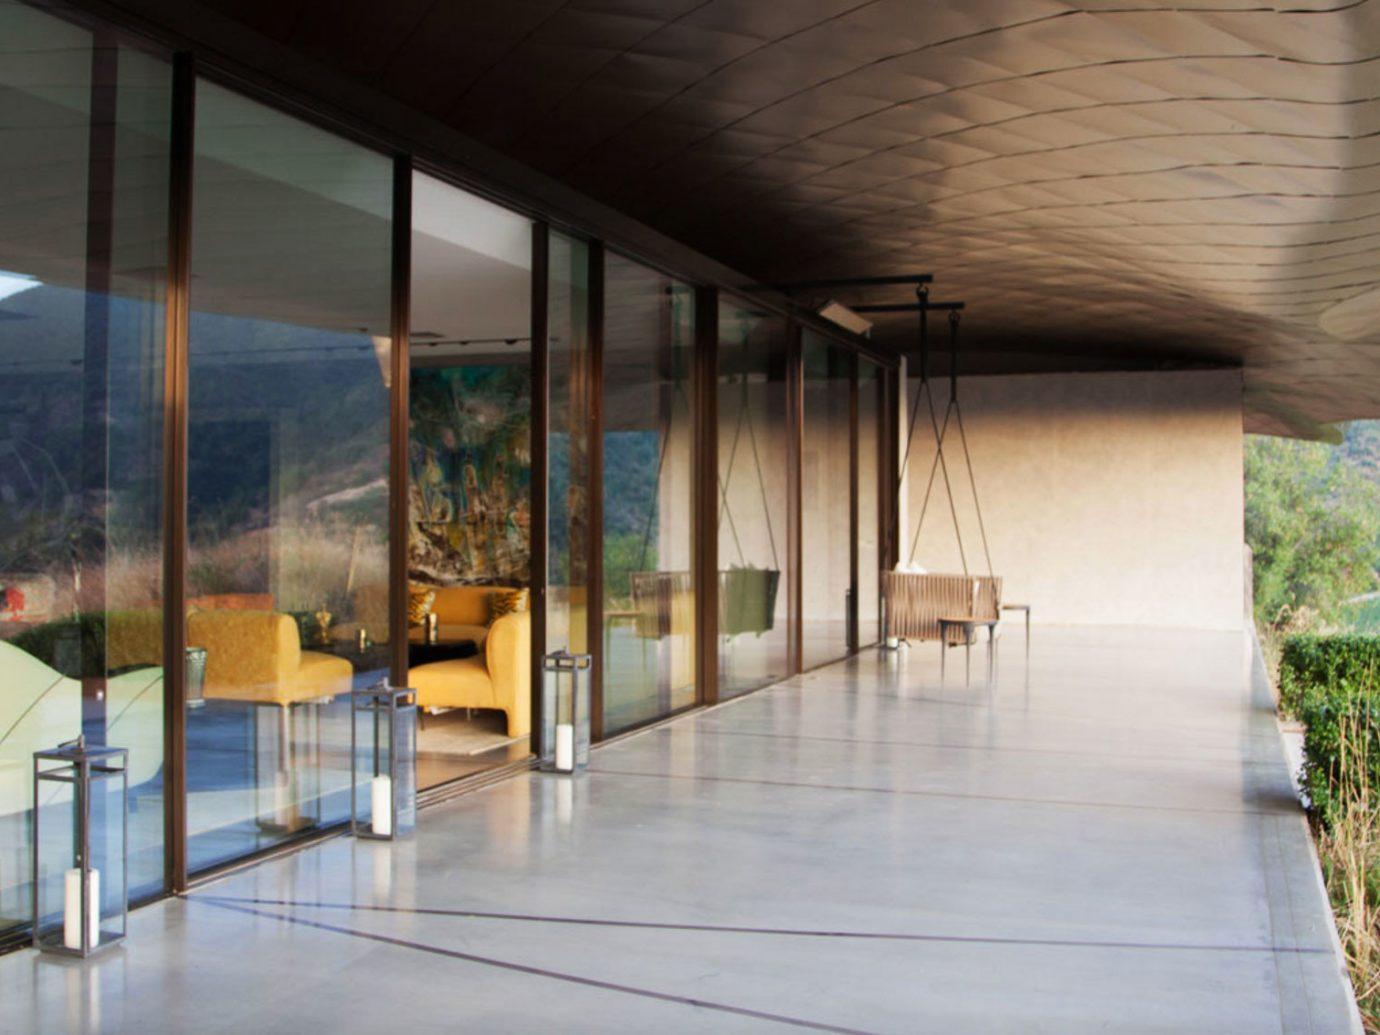 Trip Ideas floor indoor property building Architecture house estate interior design real estate home professional facade Design area wood furniture